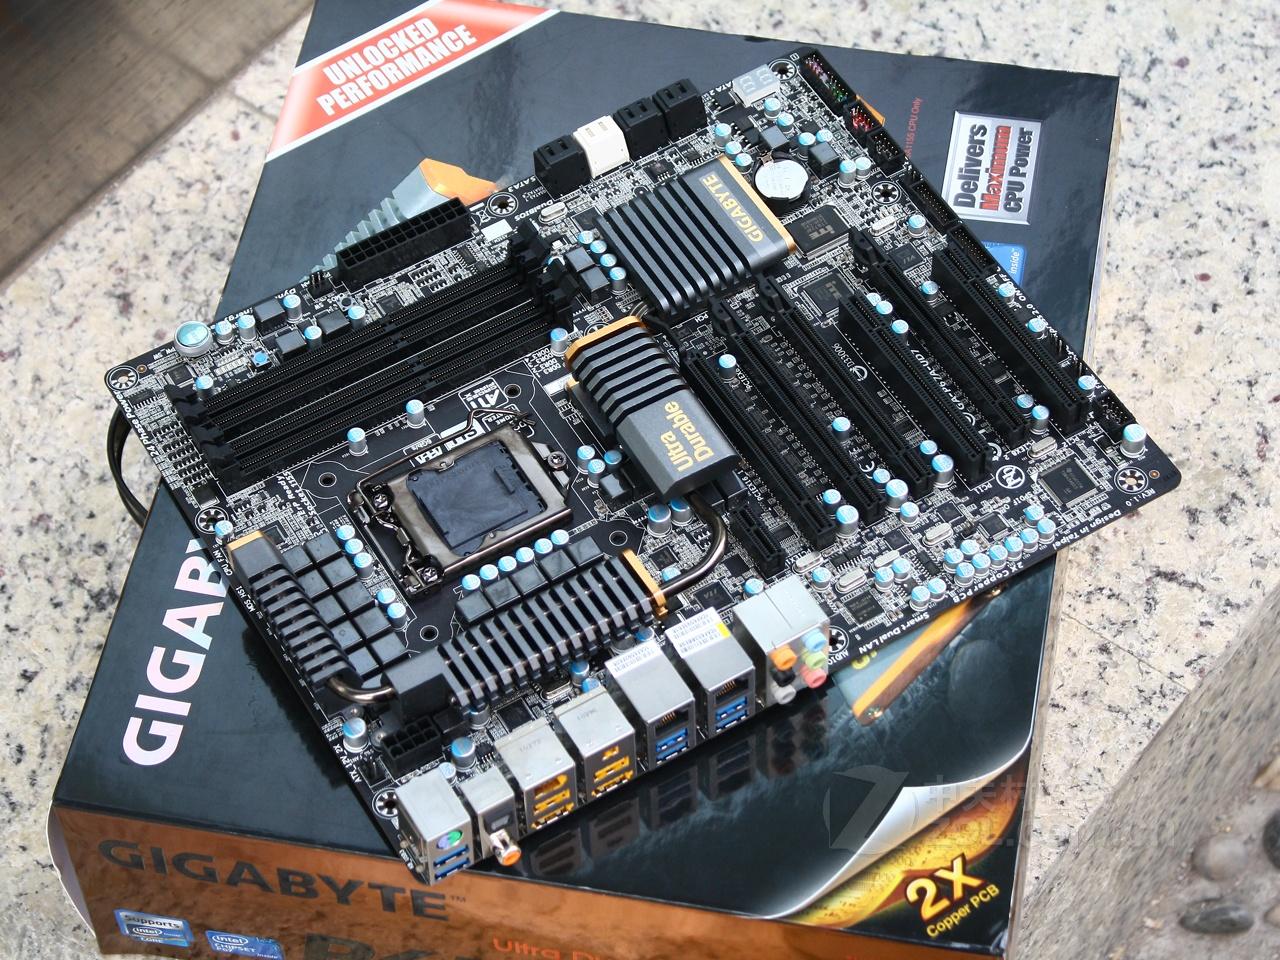 http://2e.zol-img.com.cn/product/55/866/ceqYXkOmAcTC6.jpg